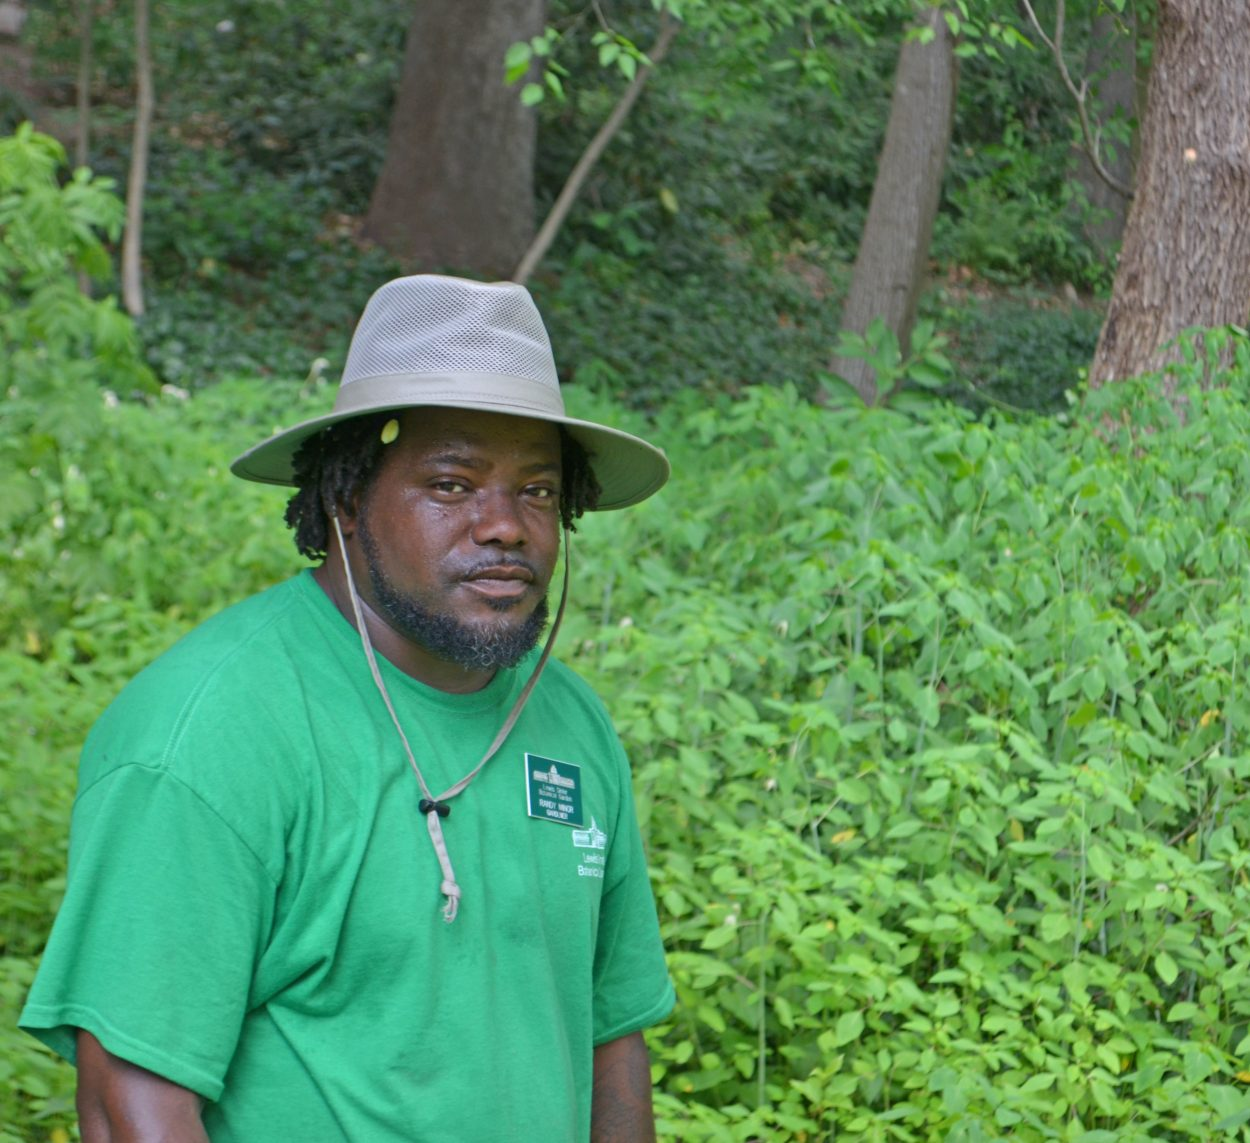 Randy Minor, Gardener, gardening.